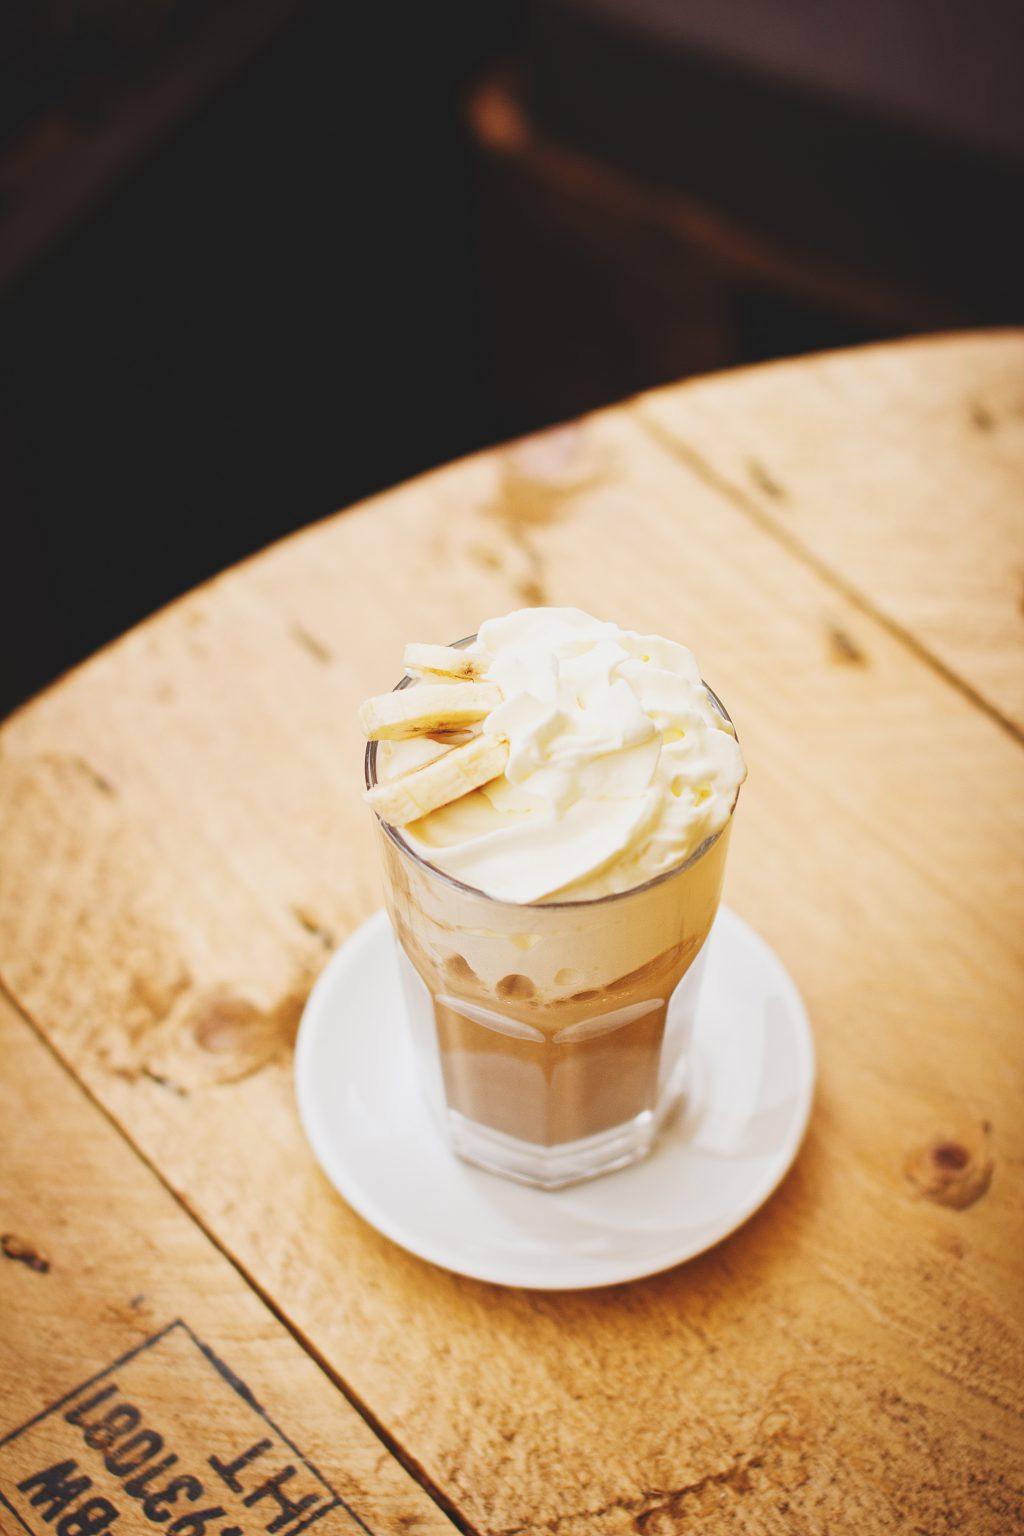 Banana latte - free stock photo